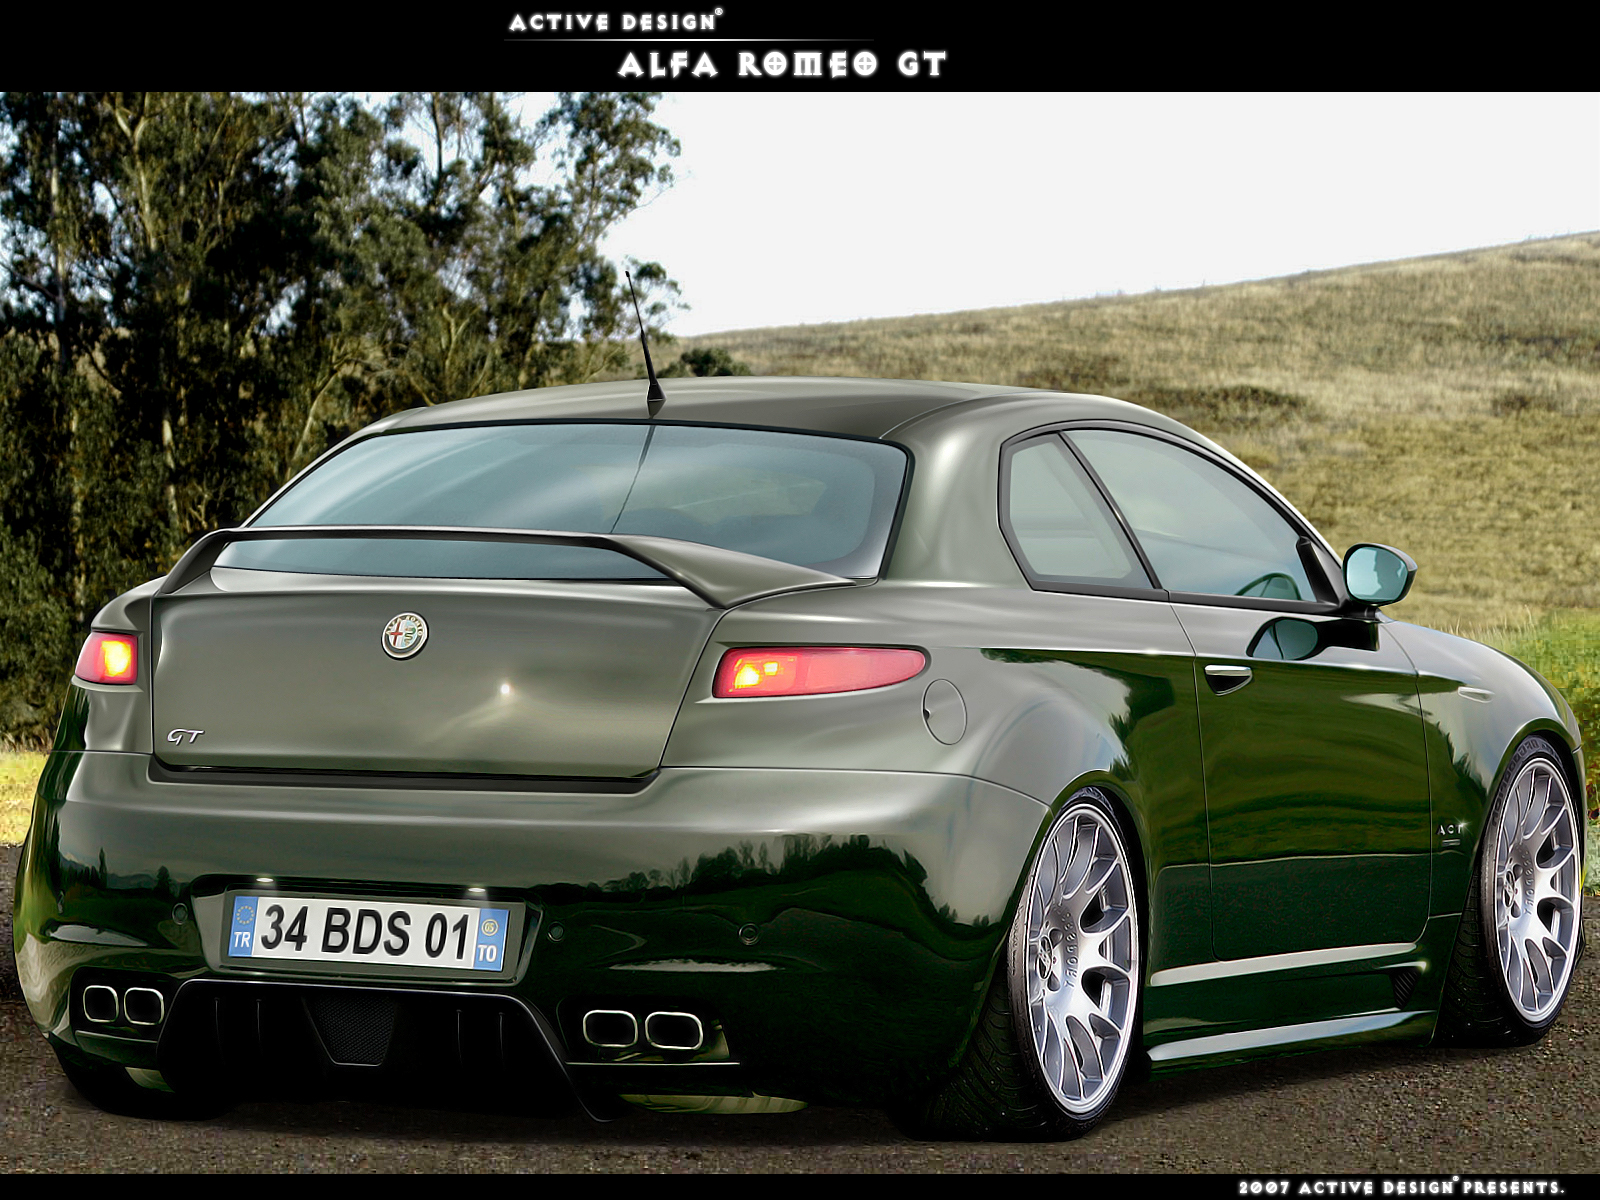 Alfa Romeo Gt By Active Design On Deviantart